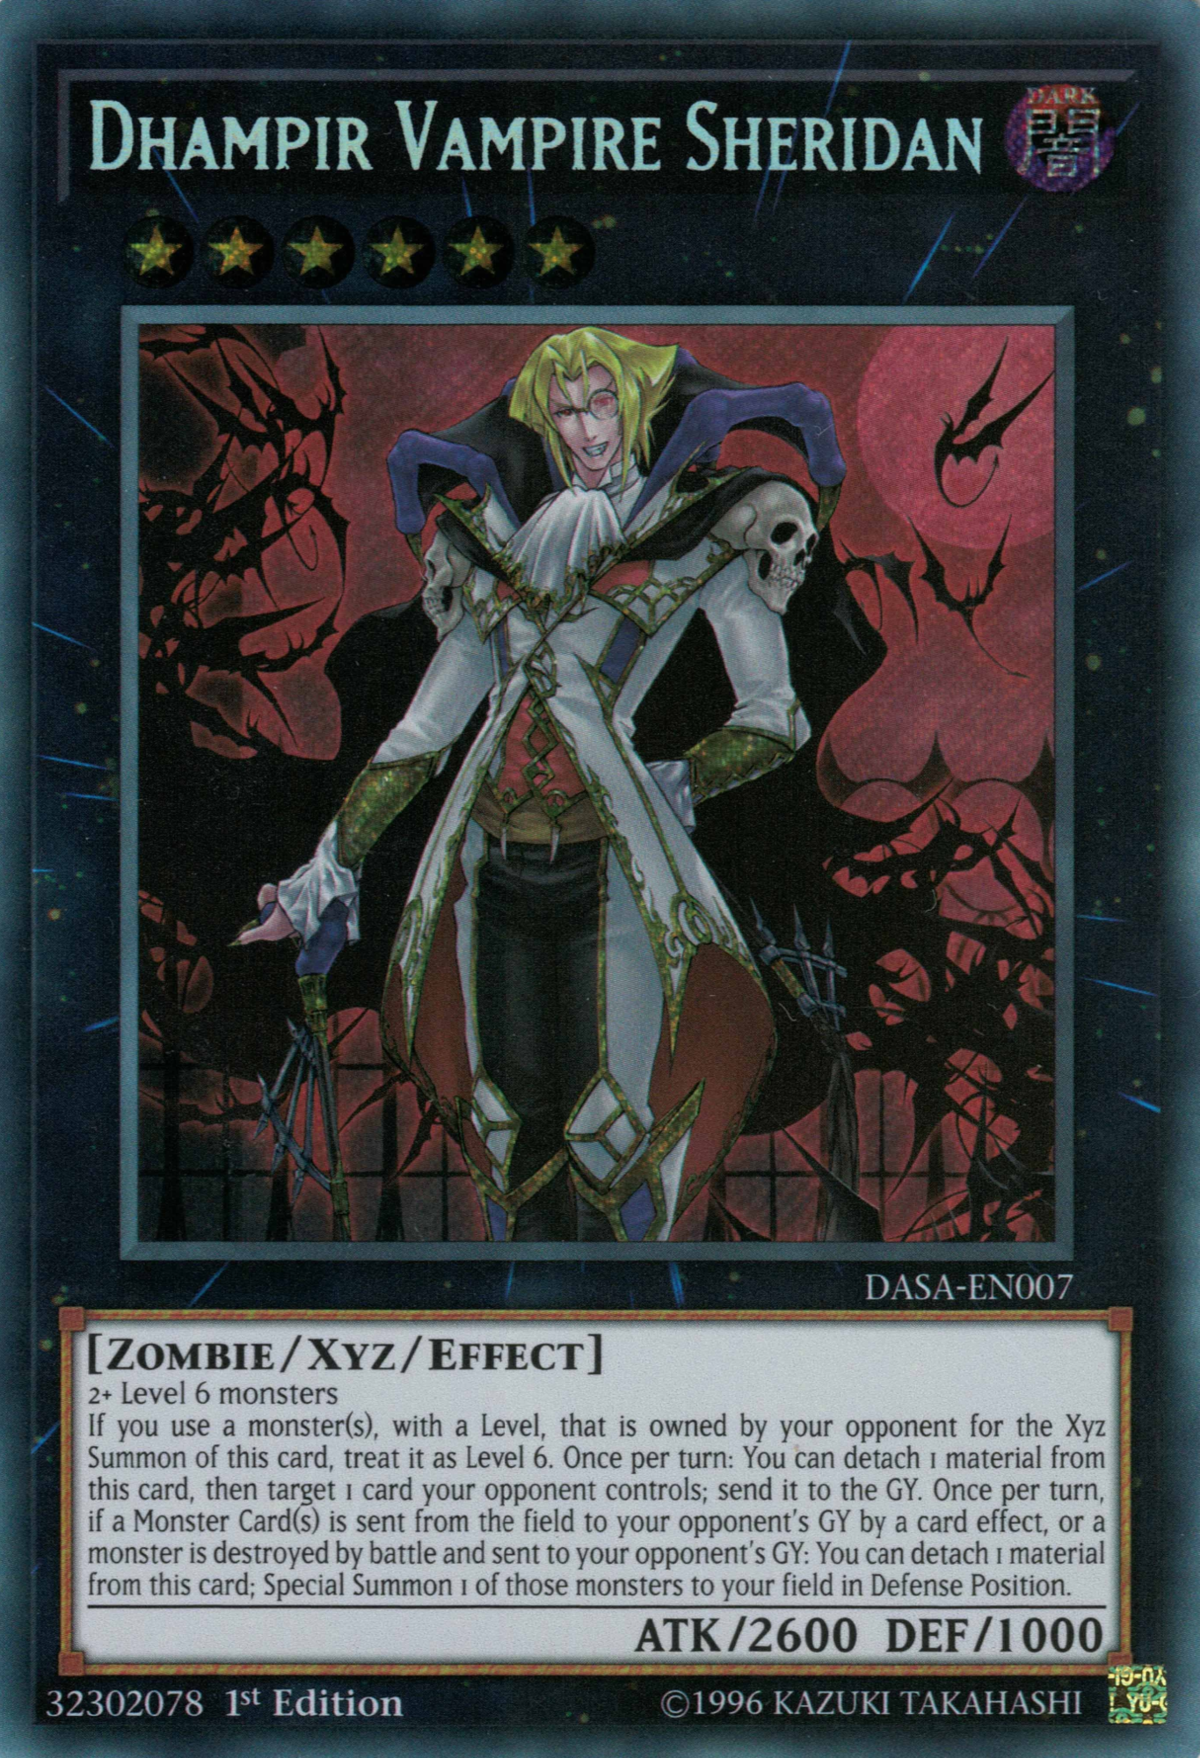 Dhampir Vampire Sheridan - Yugipedia - Yu-Gi-Oh! wiki